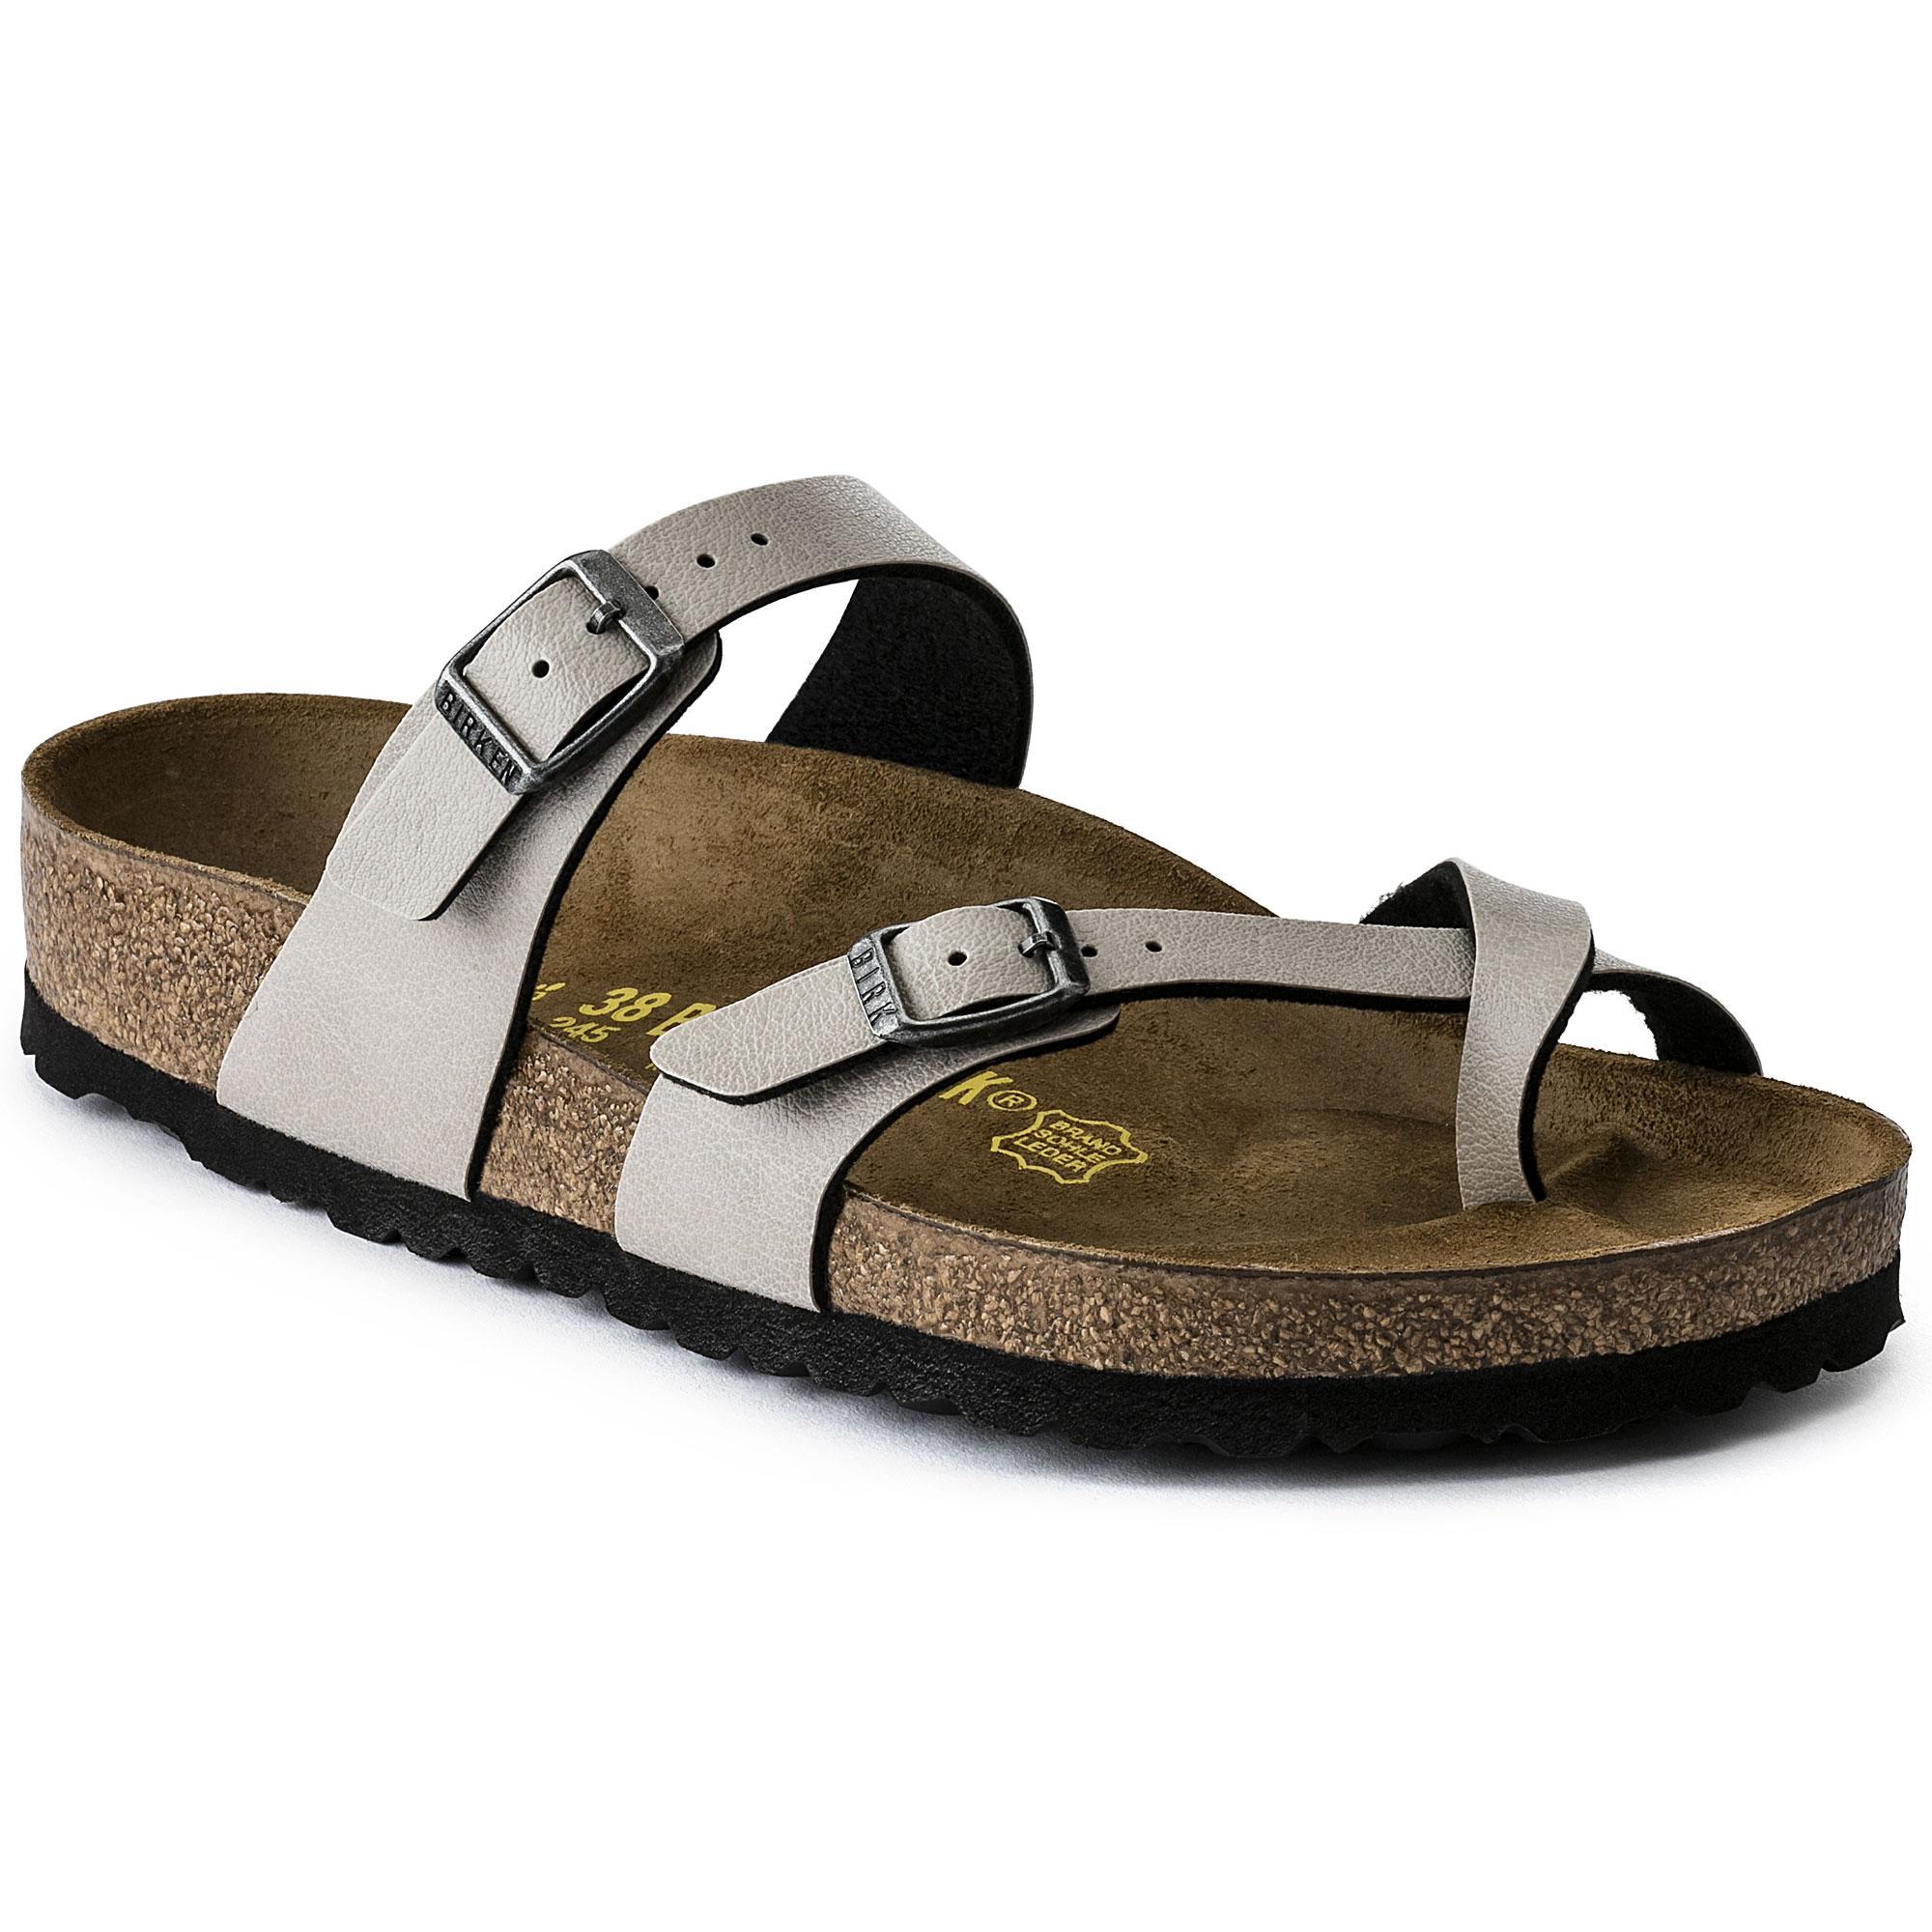 3afddeabb6d7 Flat Sandals for Women for sale - Summer Sandals online brands ...